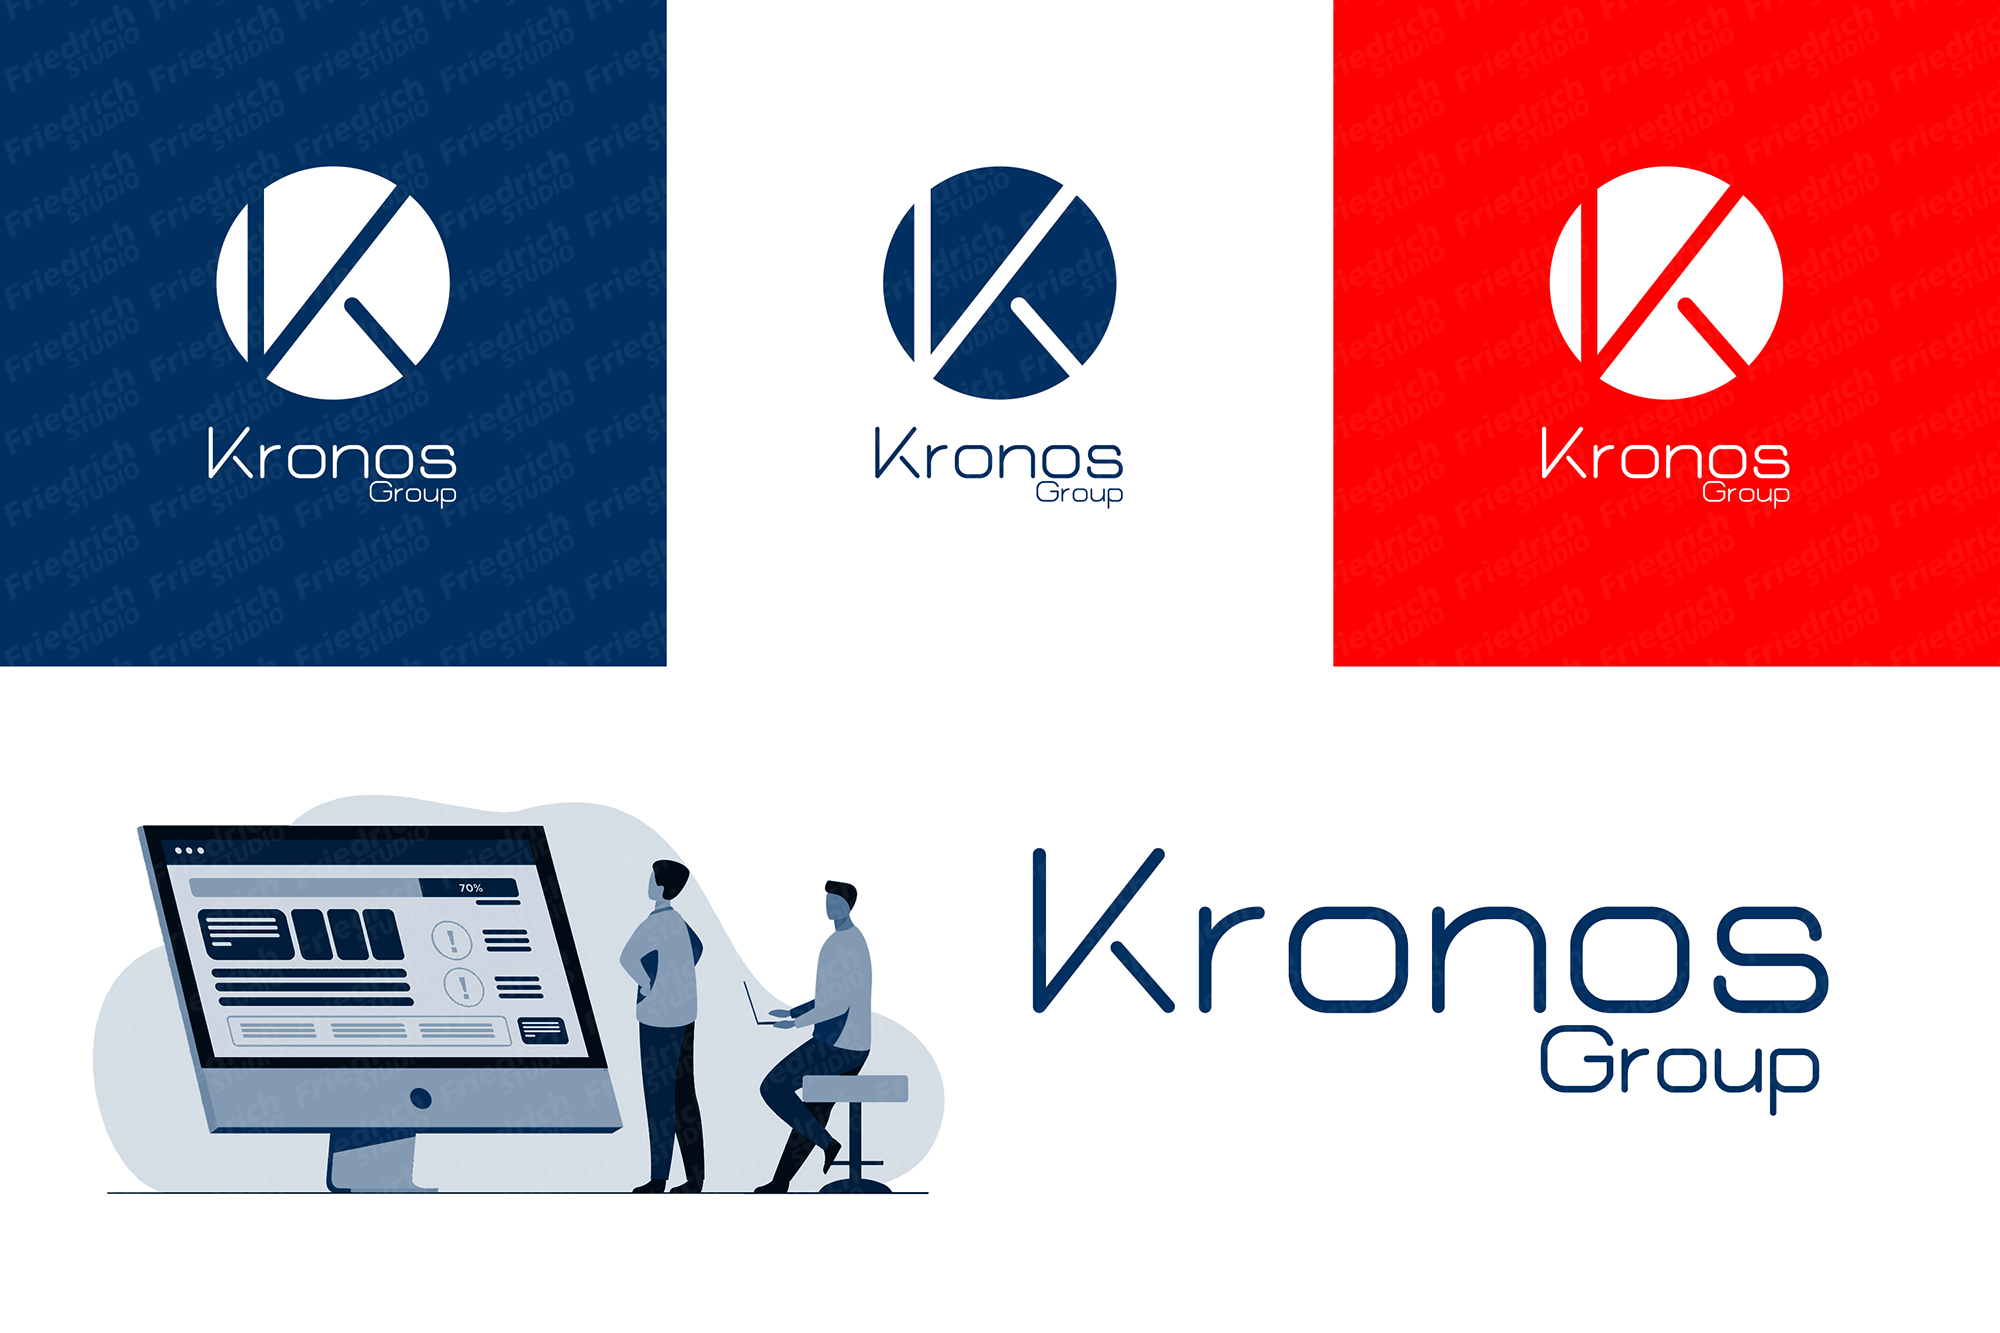 Разработать логотип KRONOS фото f_4545fafe0f9d9f25.jpg